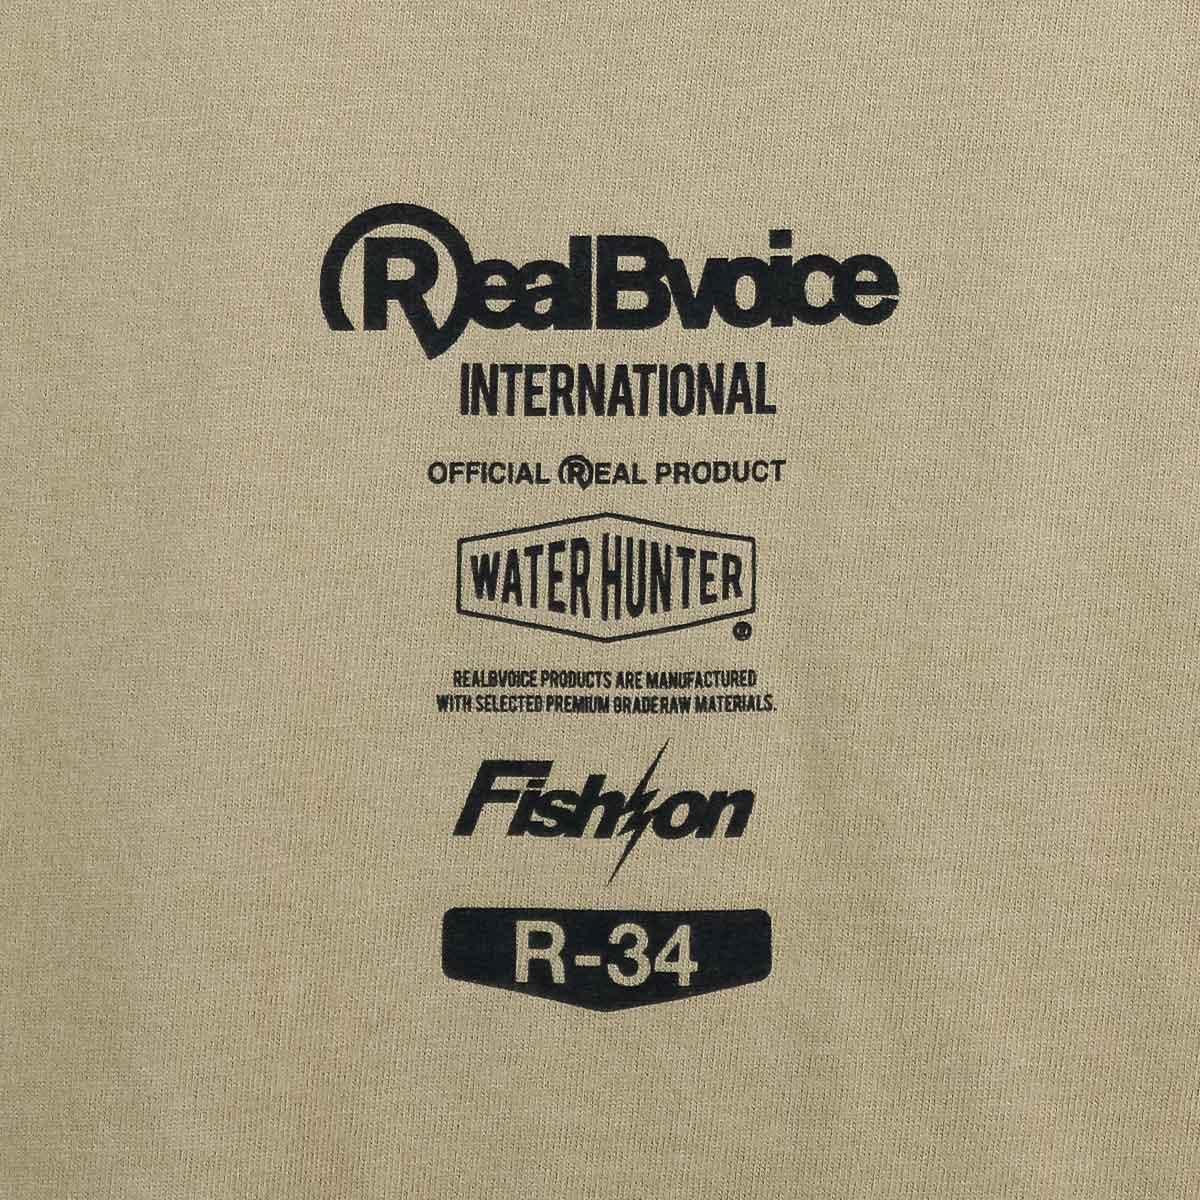 RBV FISHBONE LONG T-SHIRT BIG SIZE